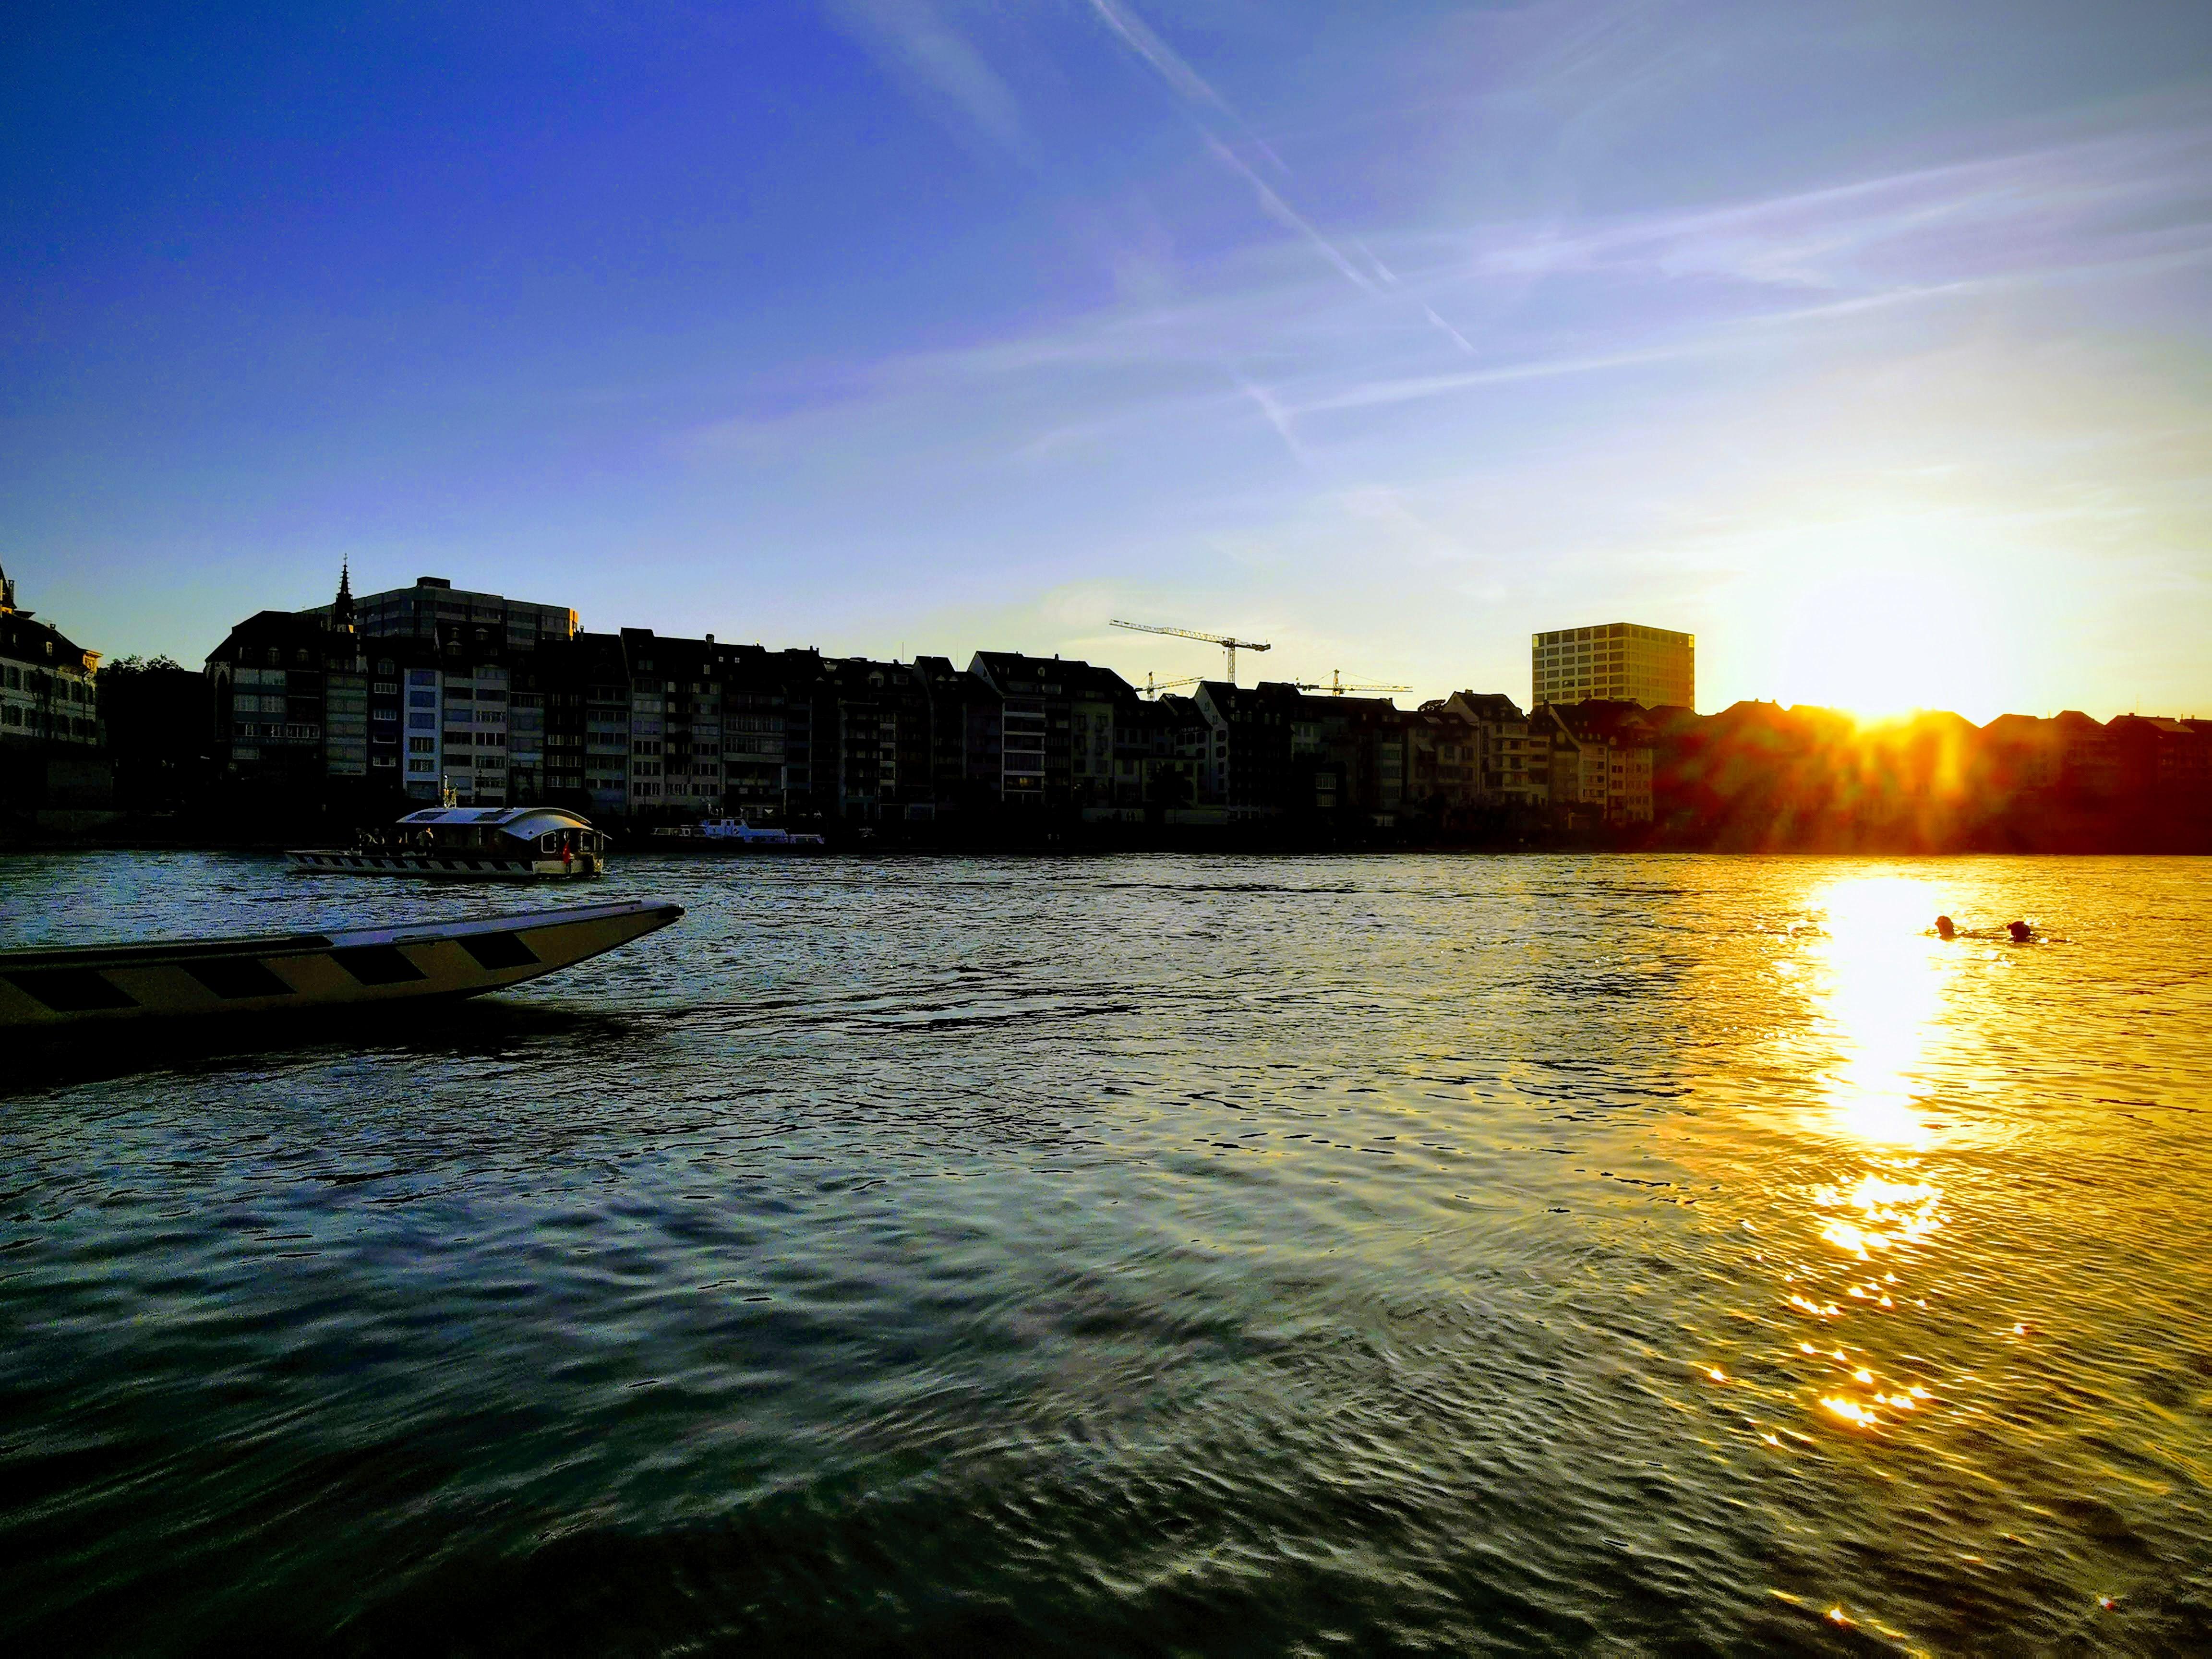 Sunset in Basel